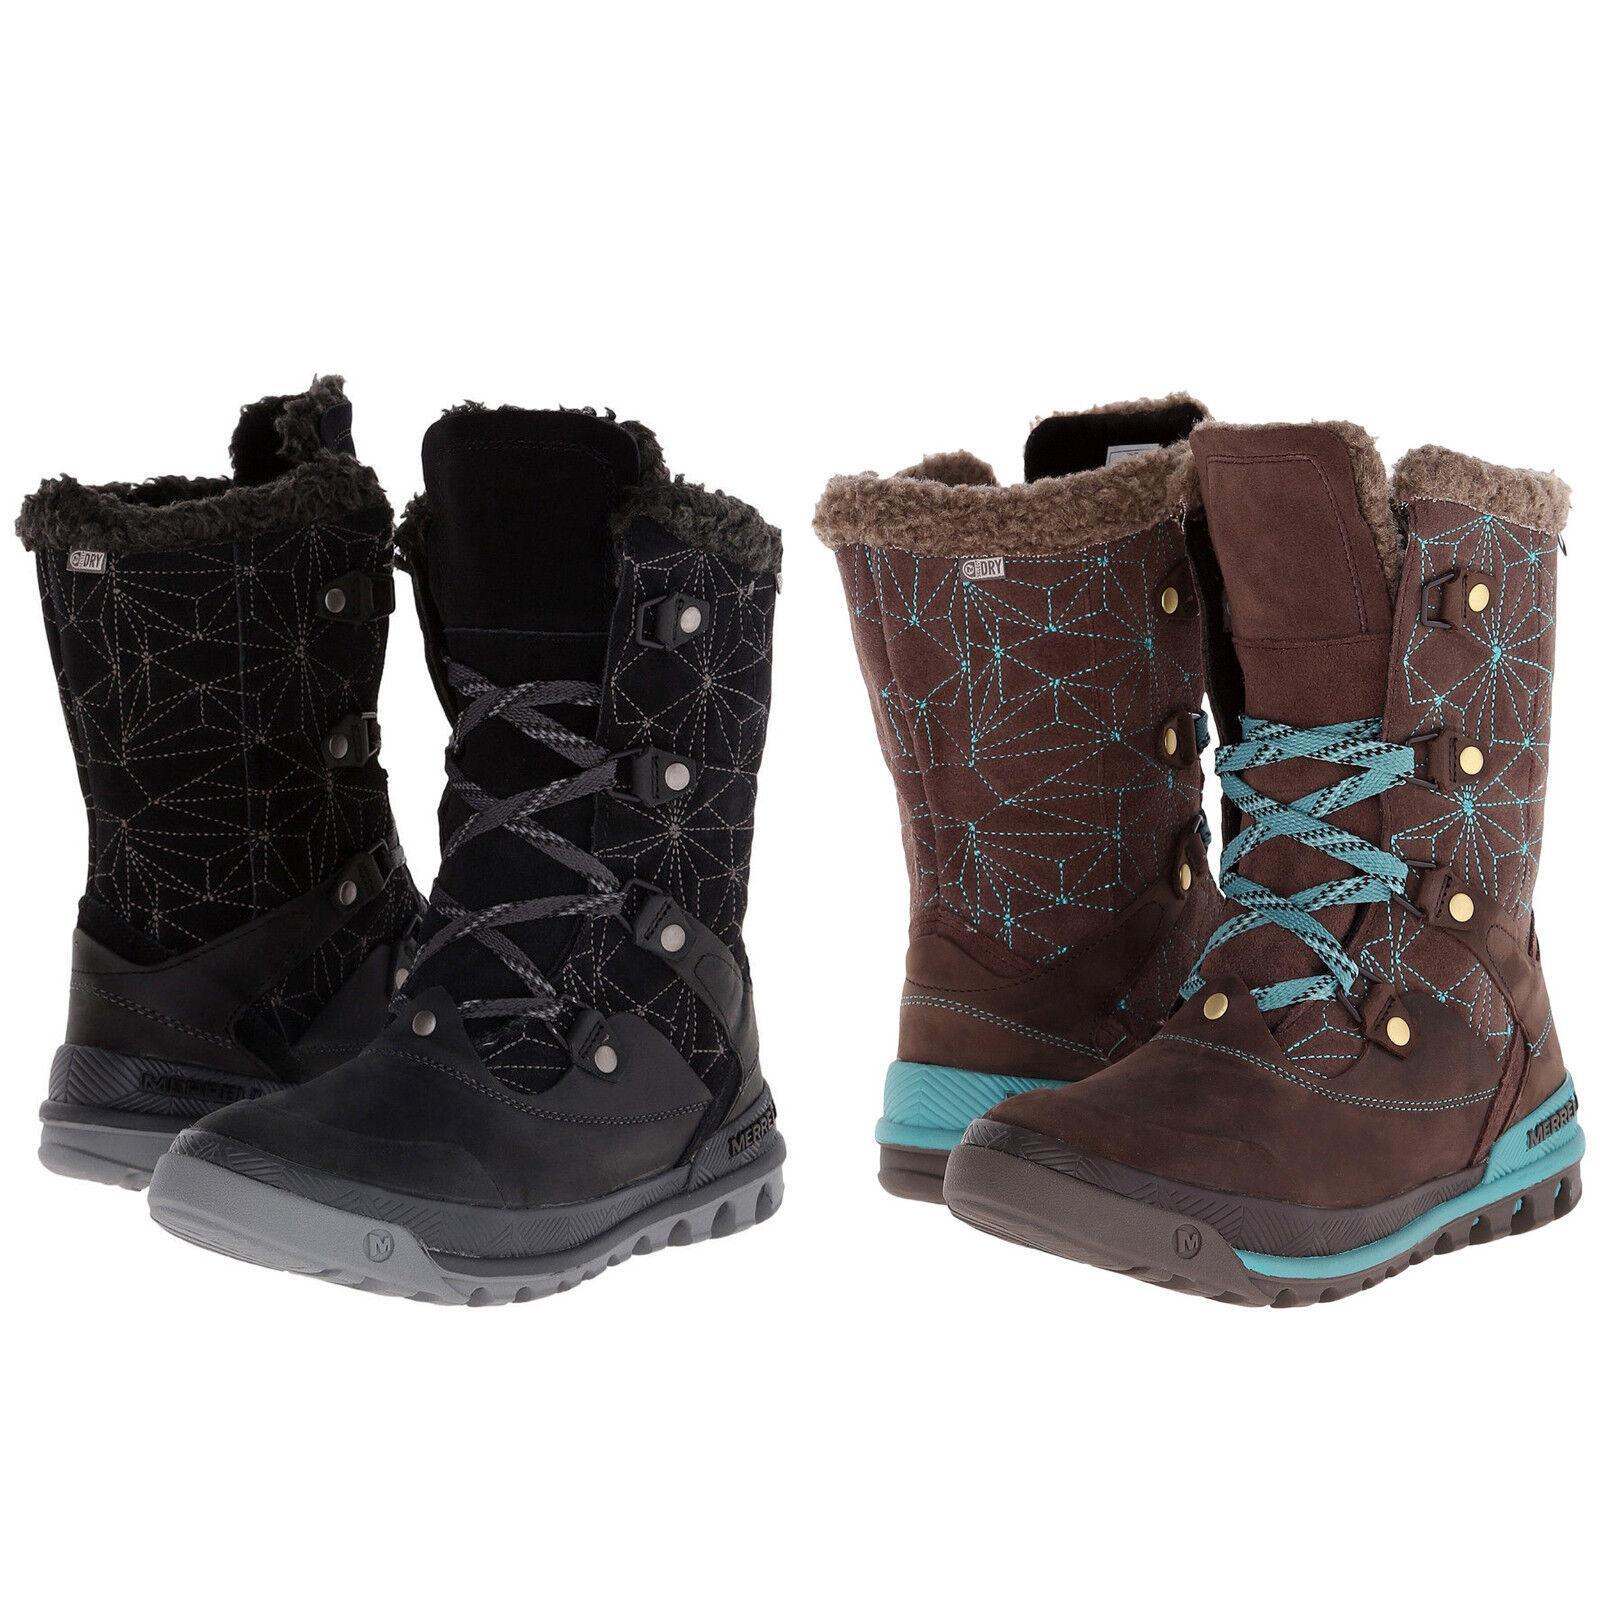 Merrell Damenschuhe Lace Silversun Lace Damenschuhe Up Side Zip Mid-Calf Waterproof Hiking Trail Stiefel 26dfbe